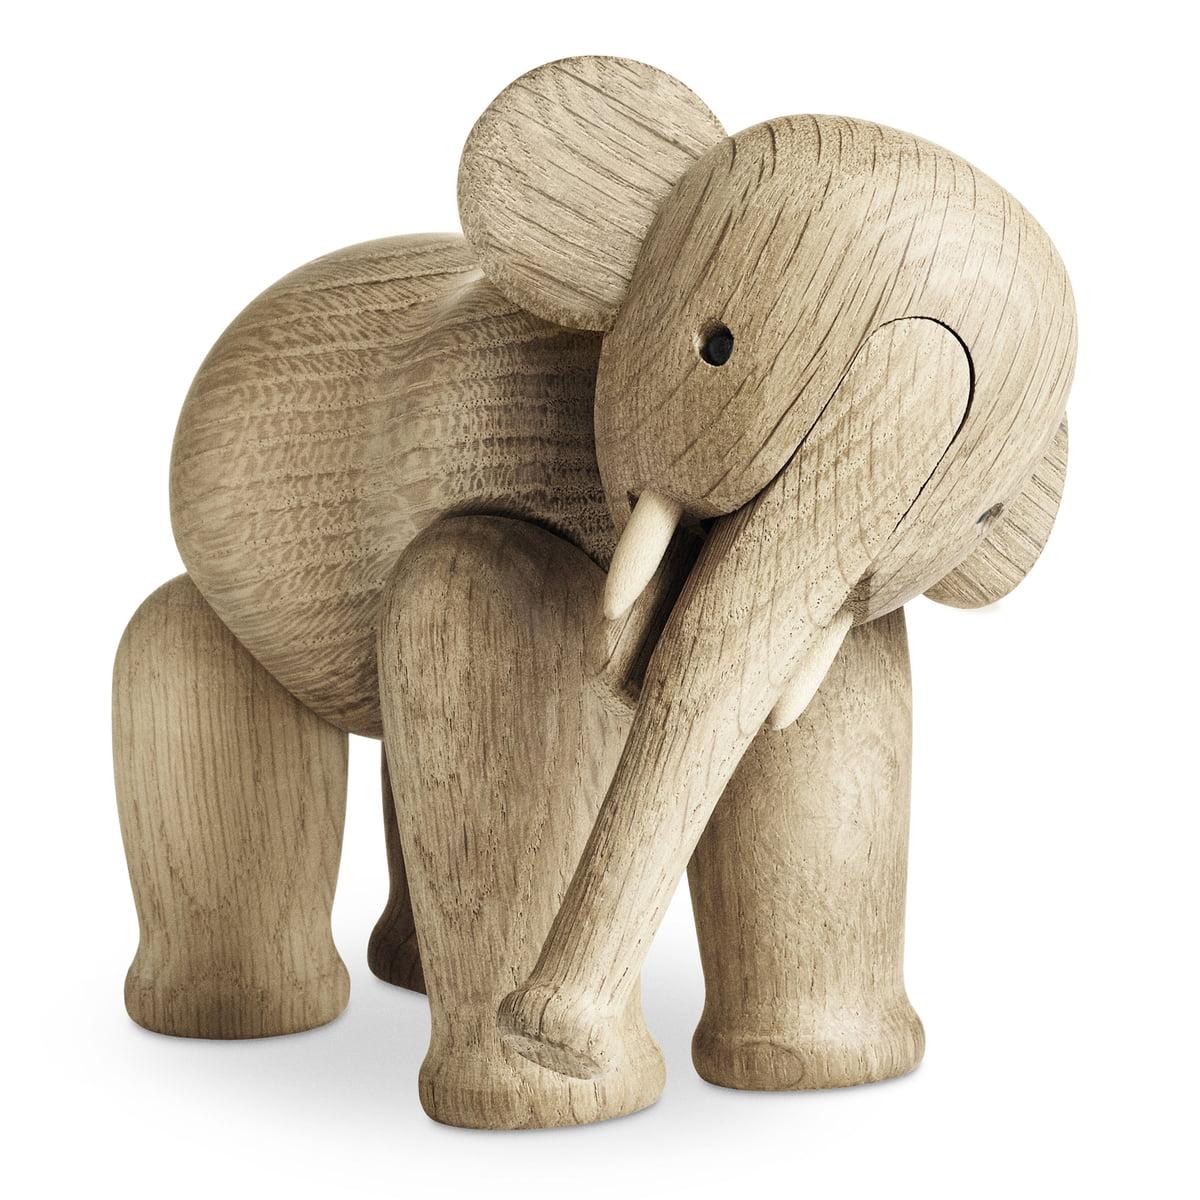 Holz-Elefant von Kay Bojesen | Connox Shop